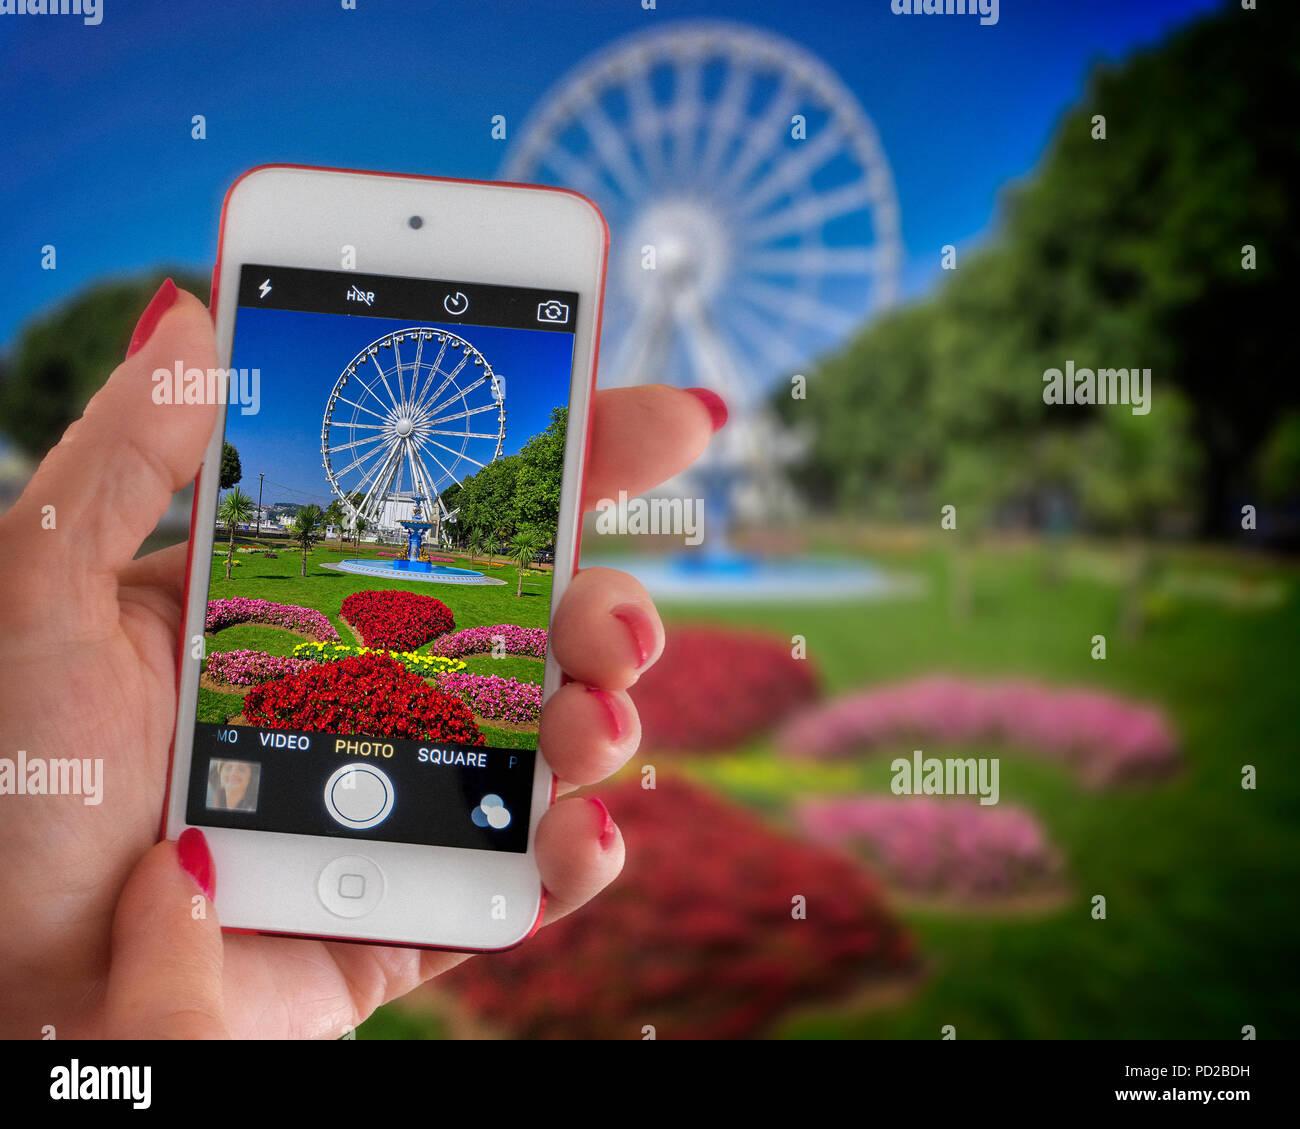 GB - DEVON: Princess Gardens and English Riviera Wheel displayed on an iPhone screen - Stock Image